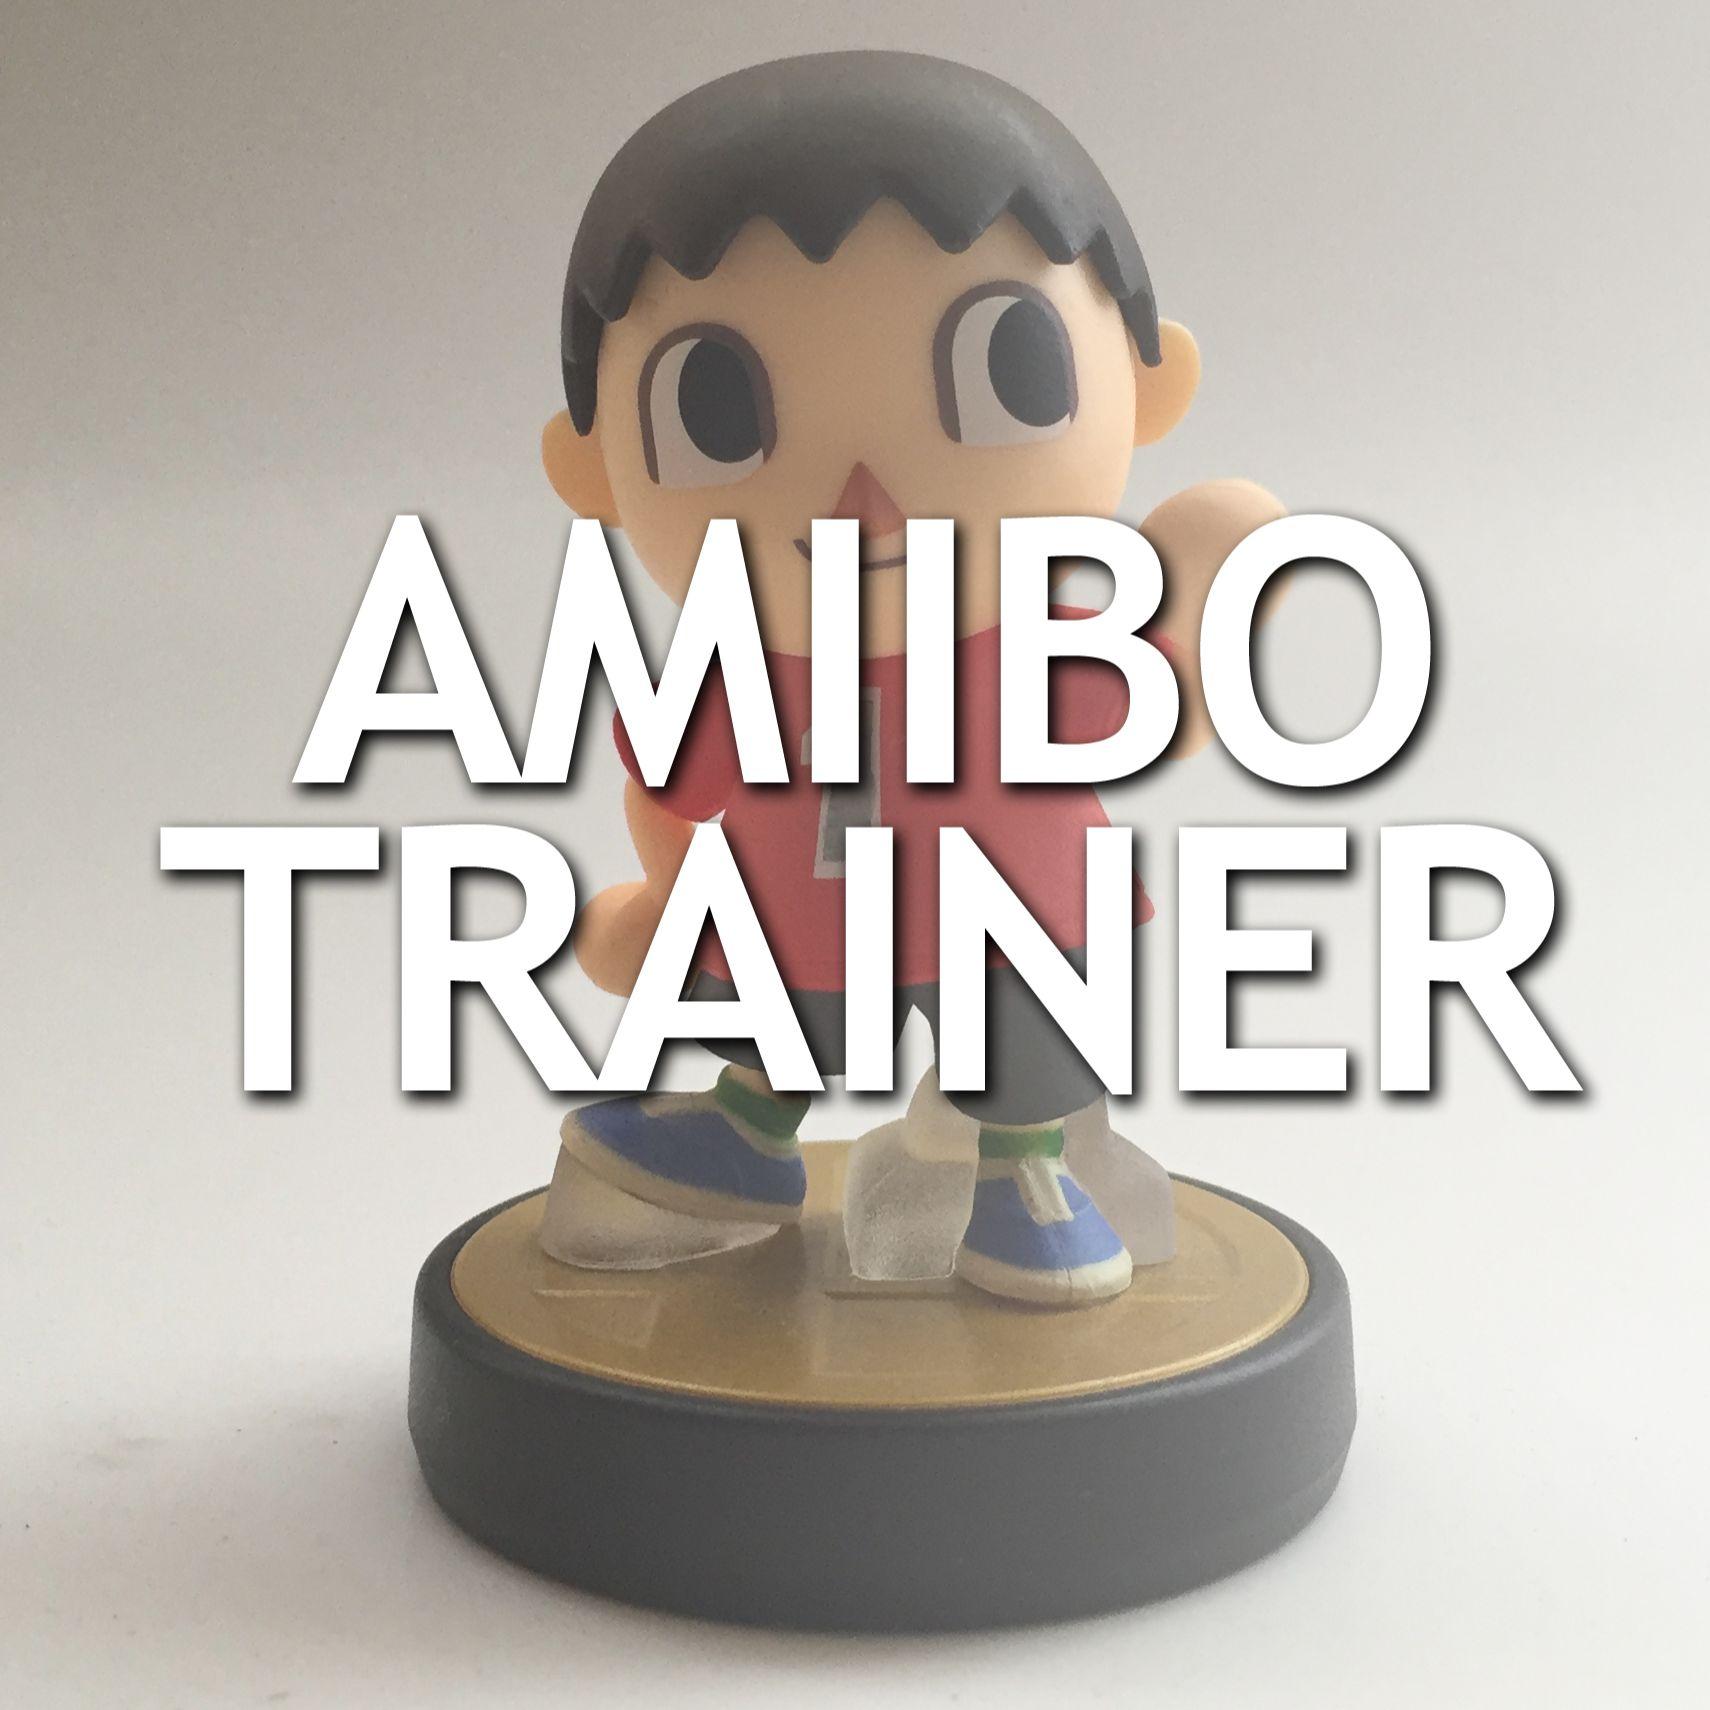 Amiibo Trainer